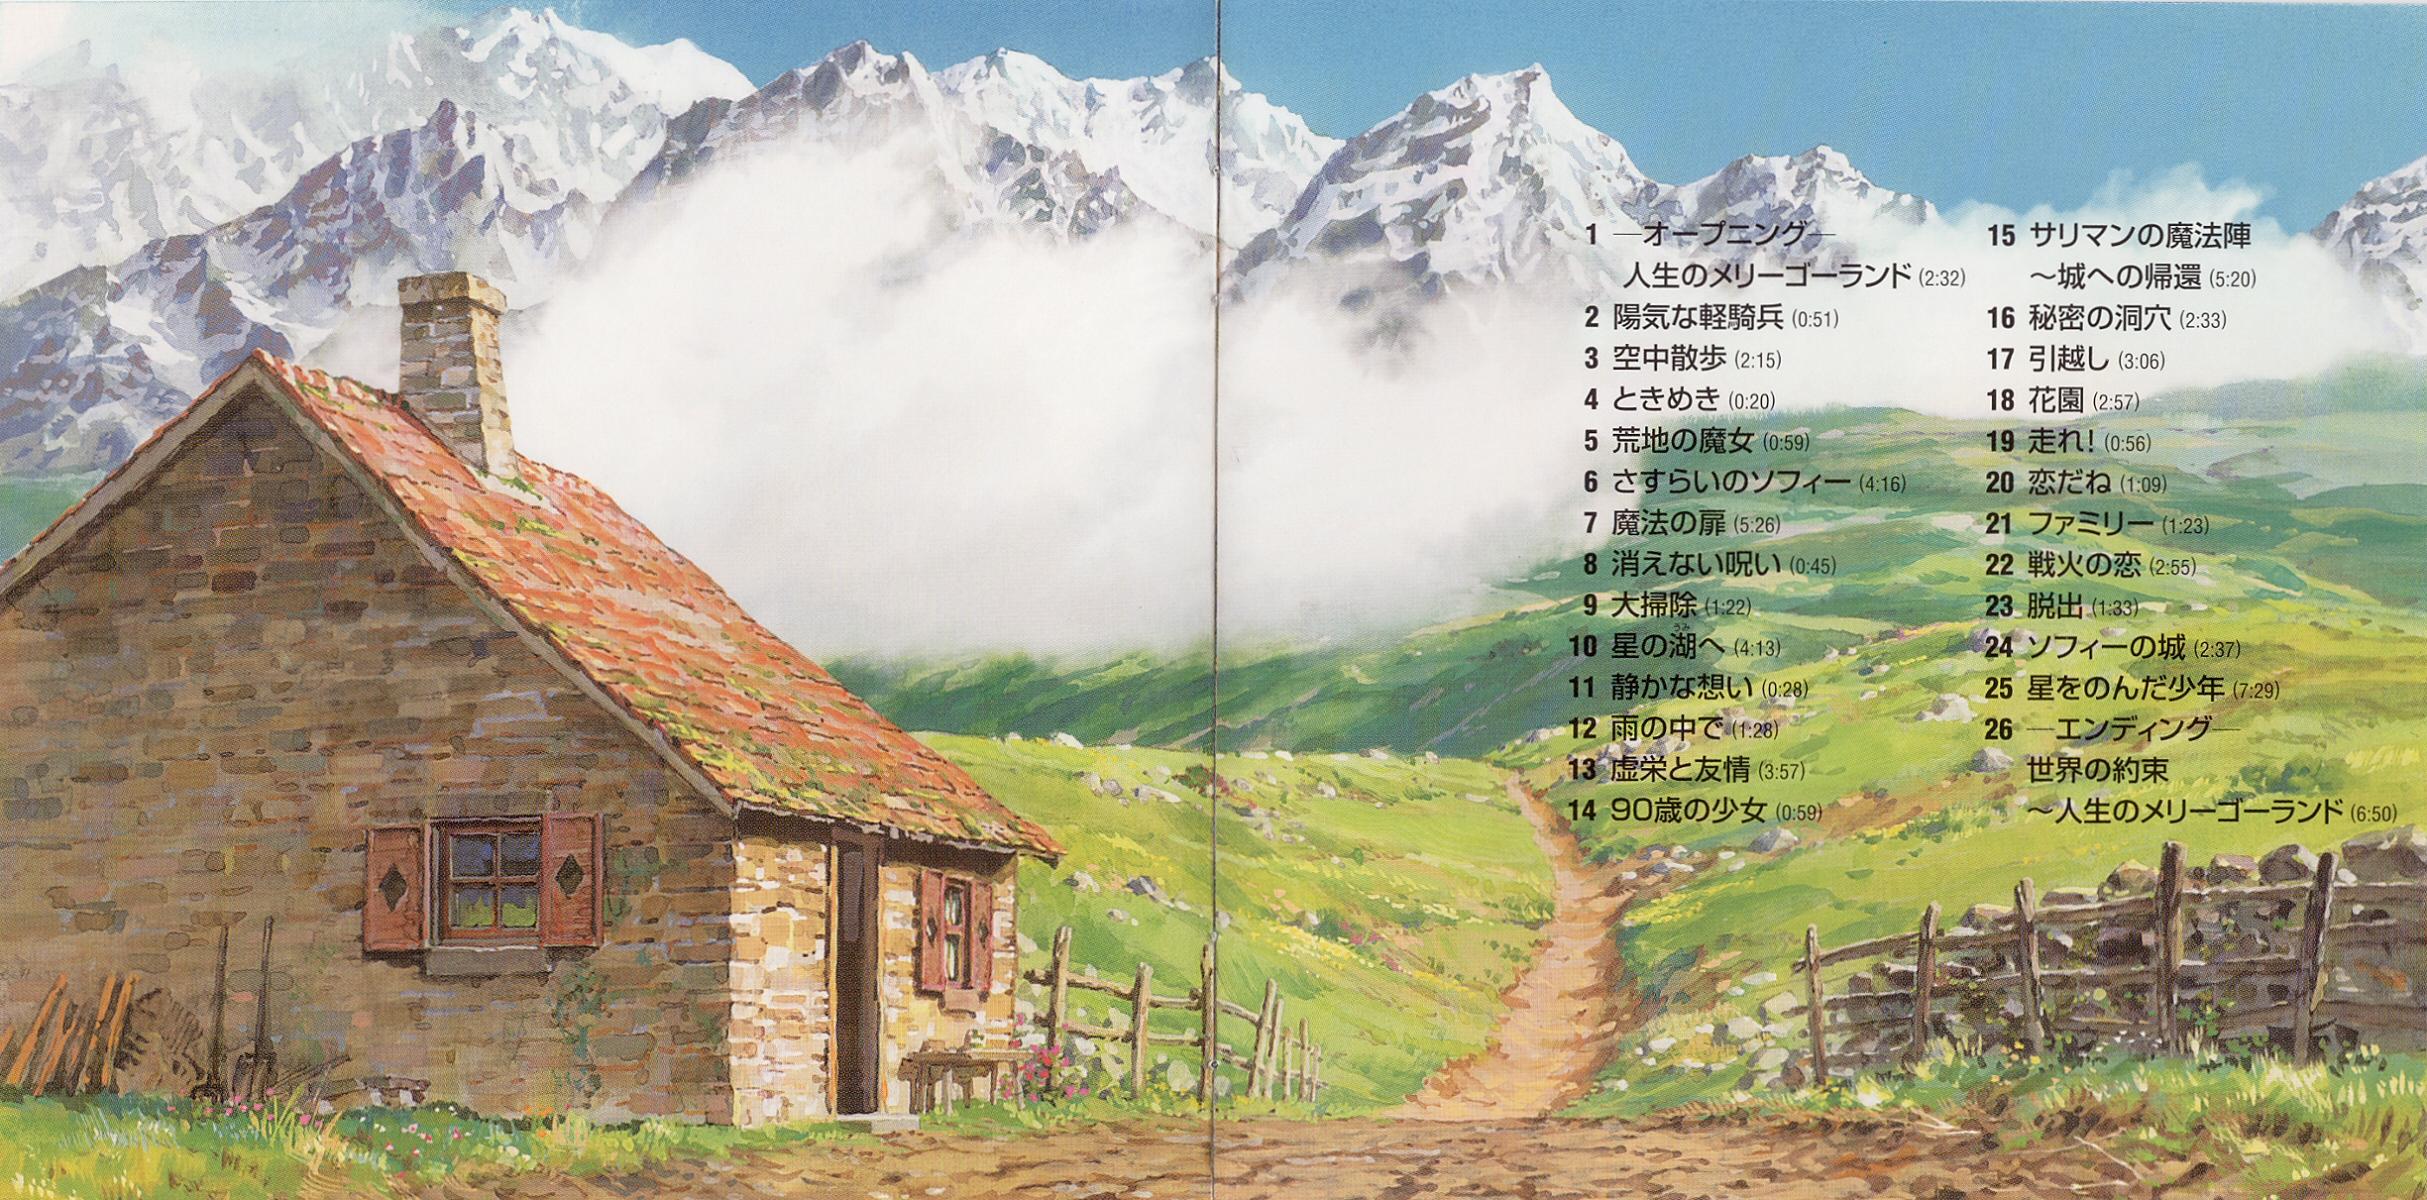 Howl's Moving Castle Soundtrack Booklet p. 01-02.jpg